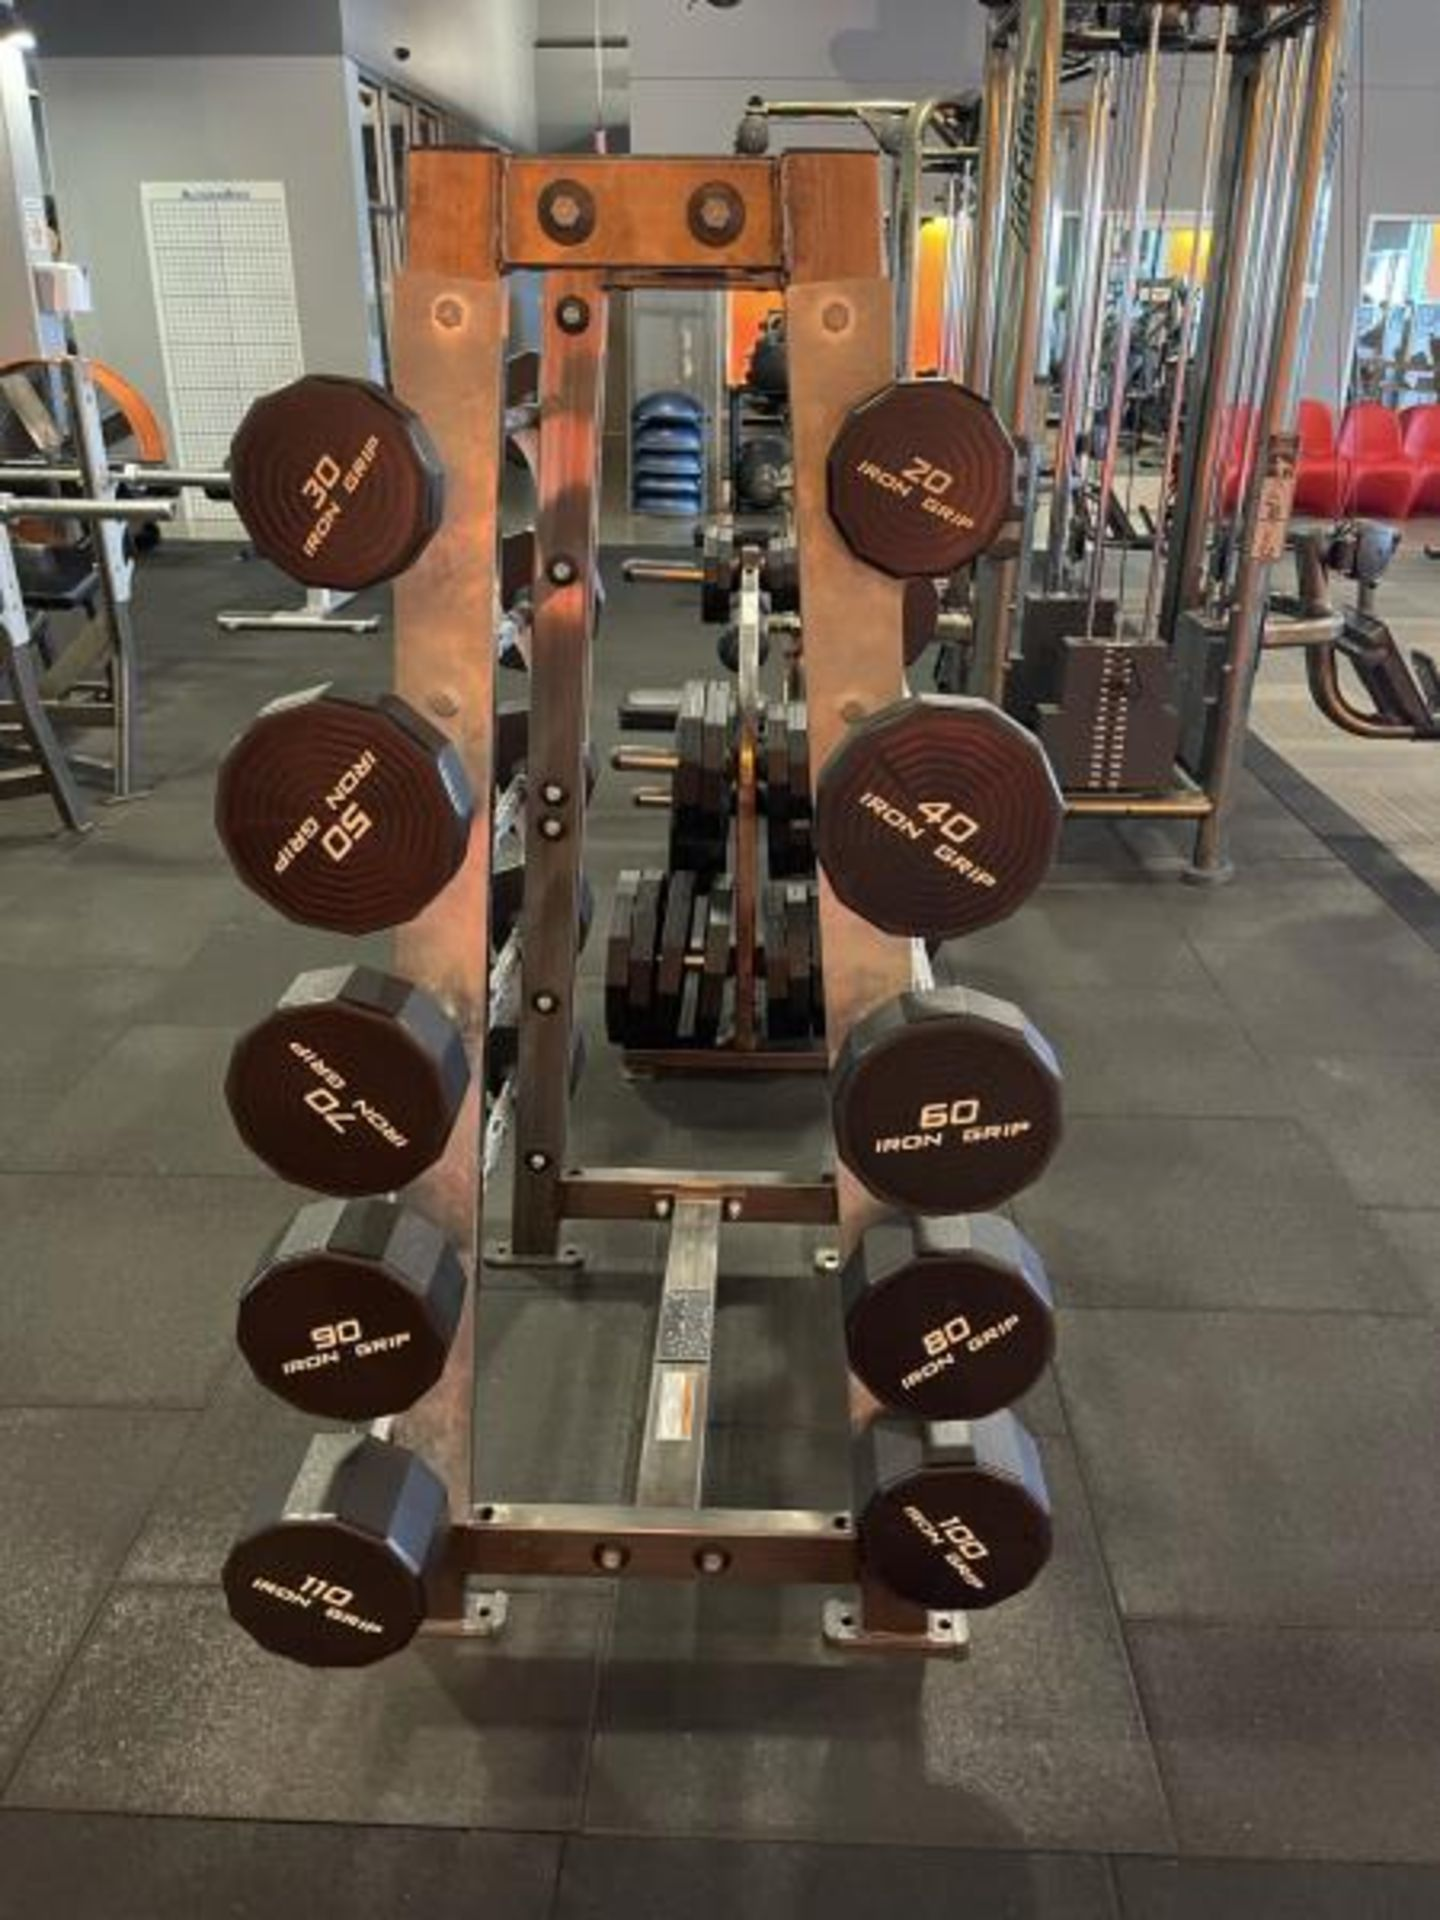 Hammer Strength A-Frame Rack with 10 Iron Grip Bars, 20-110#m M: FWBAR-A - Image 3 of 3